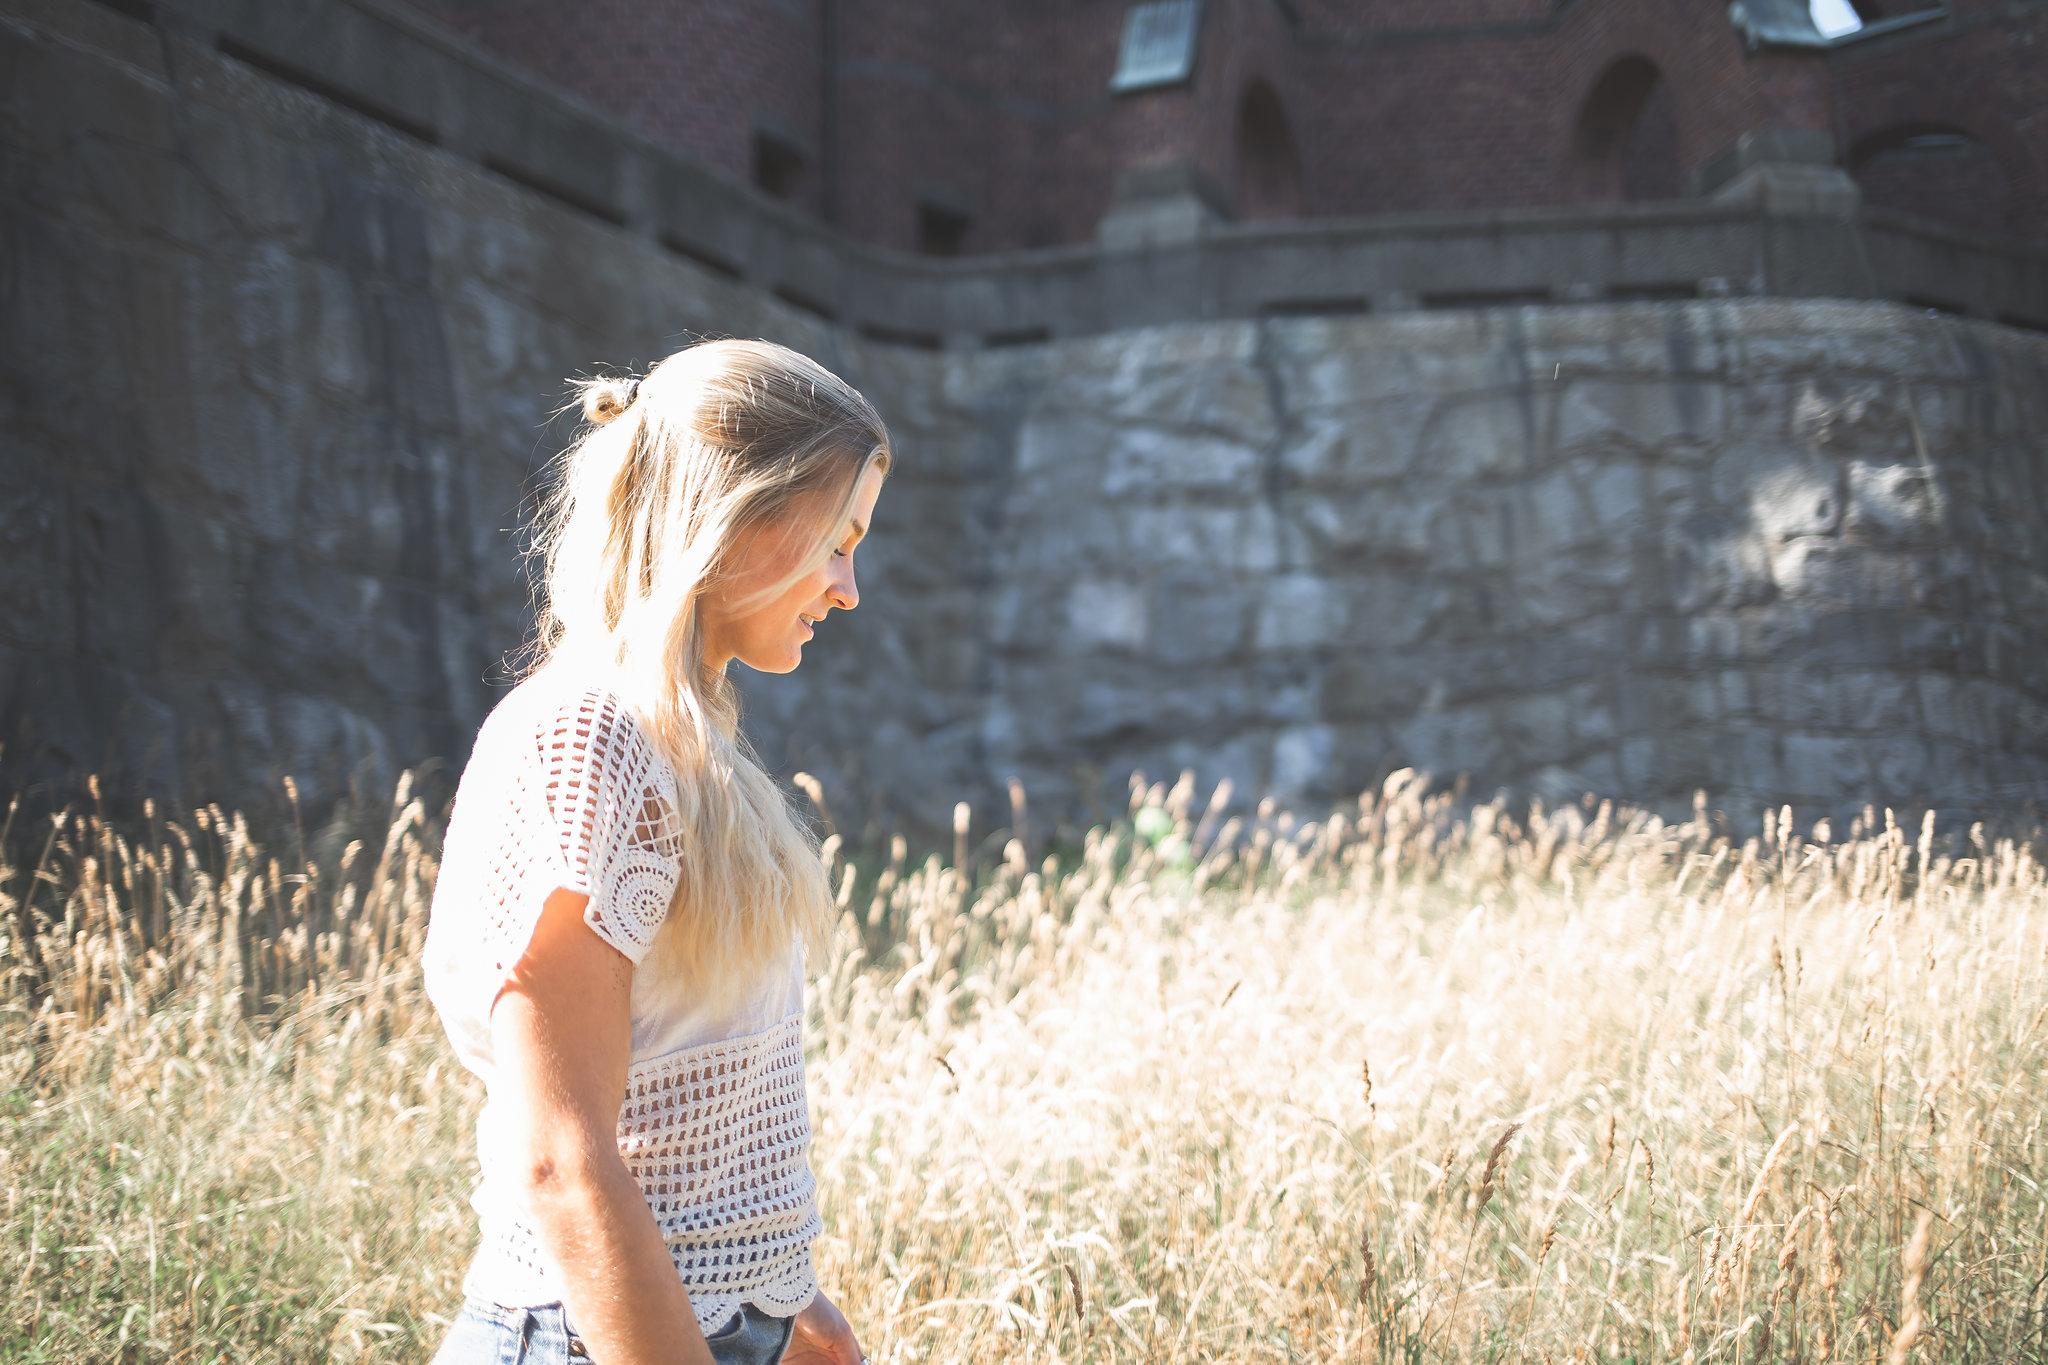 Foto: Caroline Frankesjö